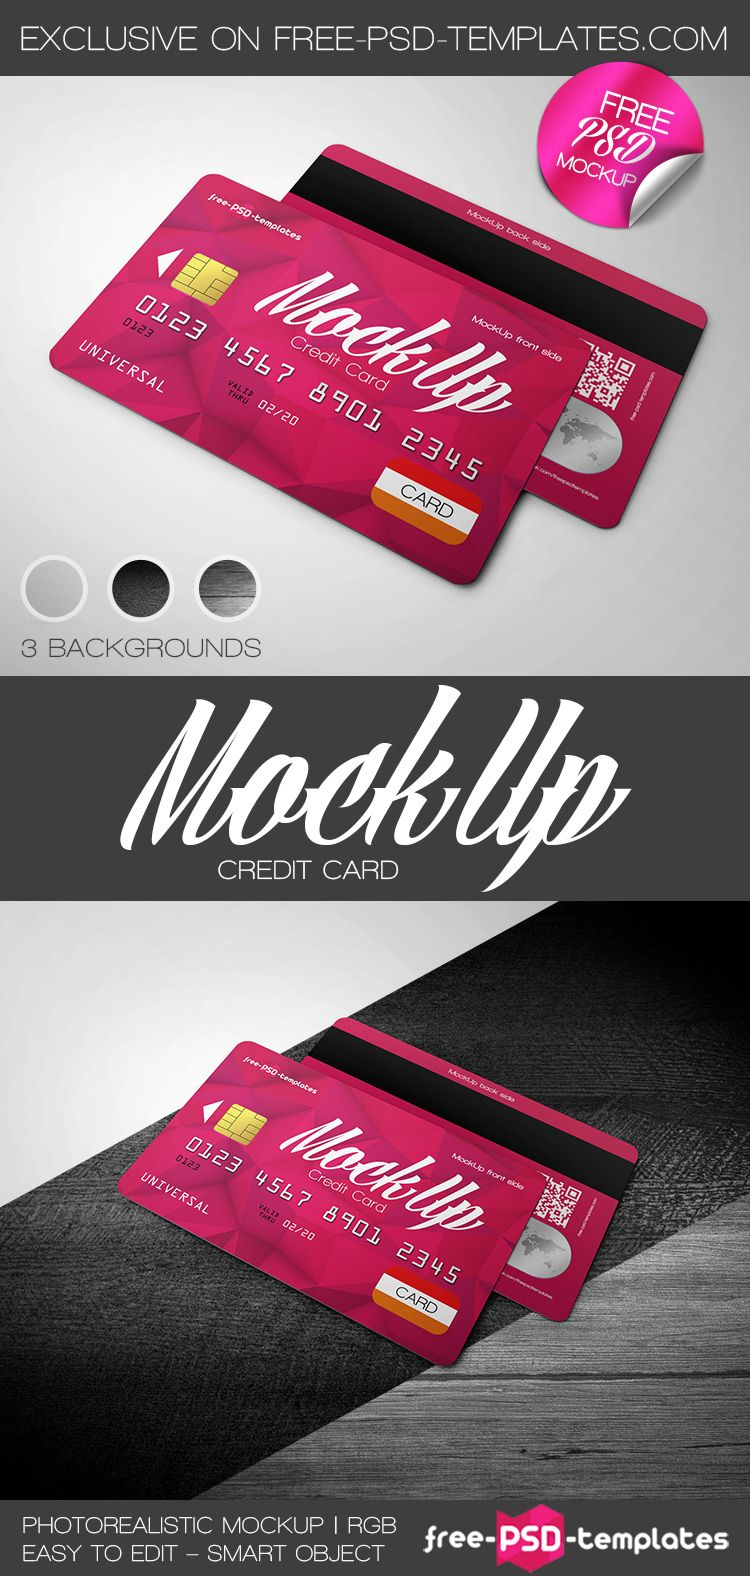 Free Credit Card Mock Up In Psd Design Mockup Free Credit Card Design Mockup Template Free